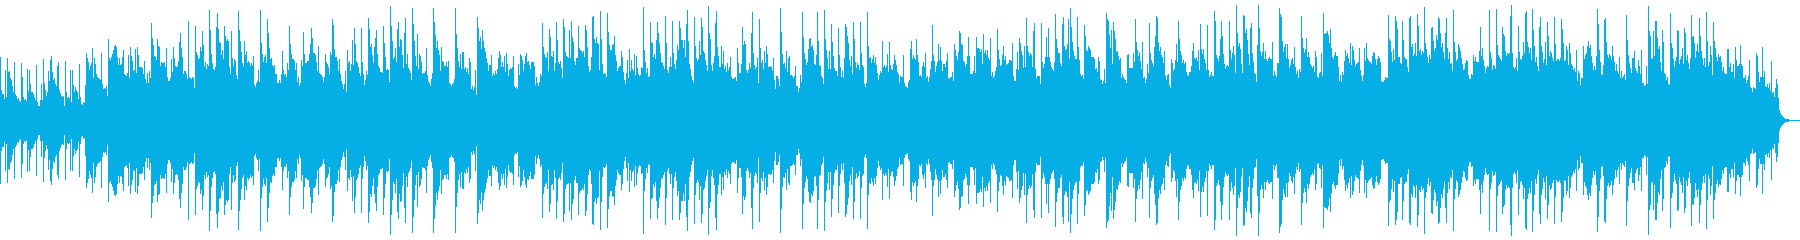 chill風ジムノペディ 第1番の再生済みの波形